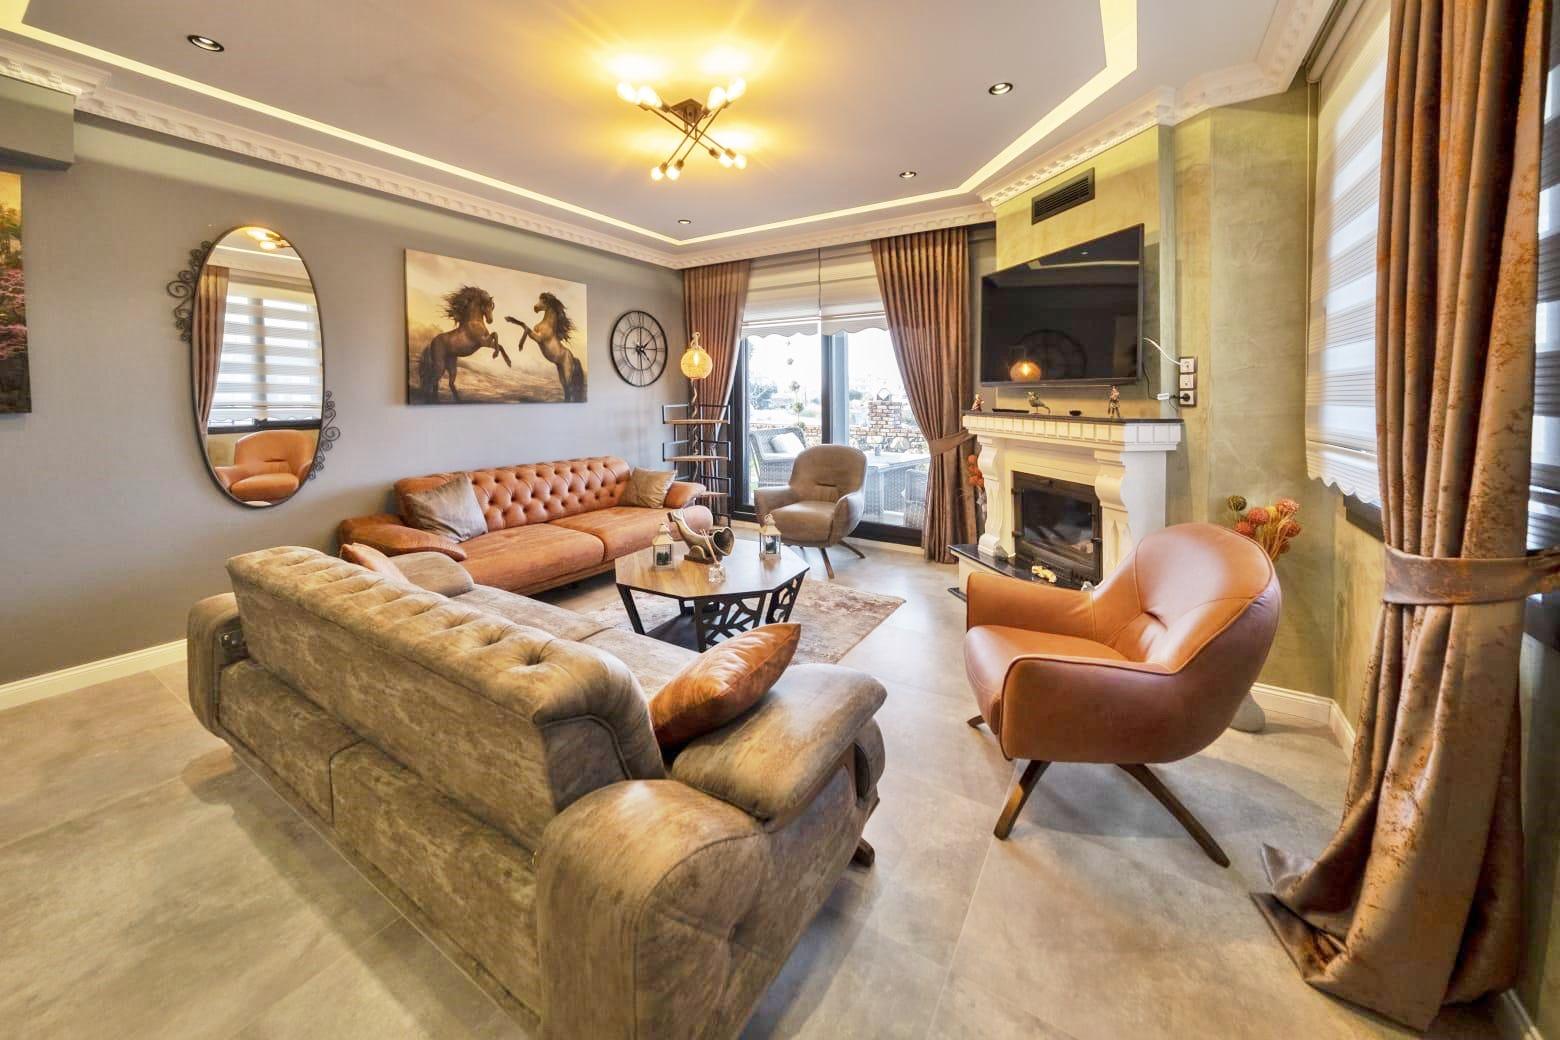 Spacious Semi-detached villa  near Mavisehir – Buy-to-let investment